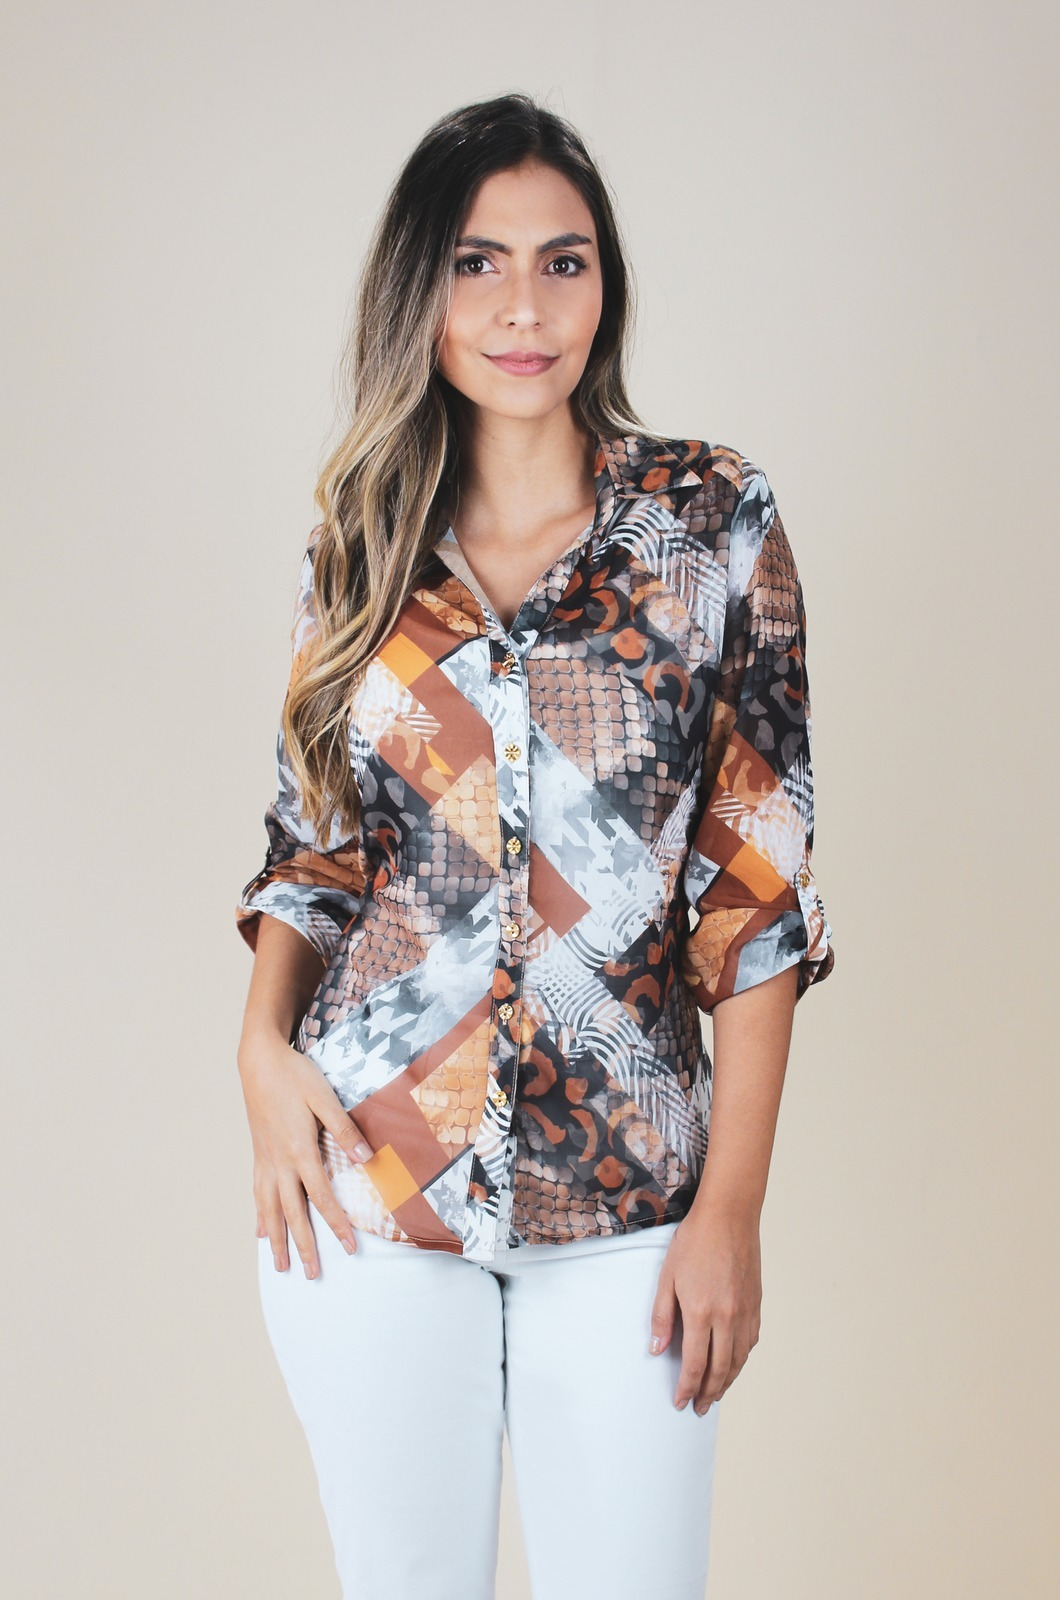 Blusa camisera manga larga - Chazari 4987-9